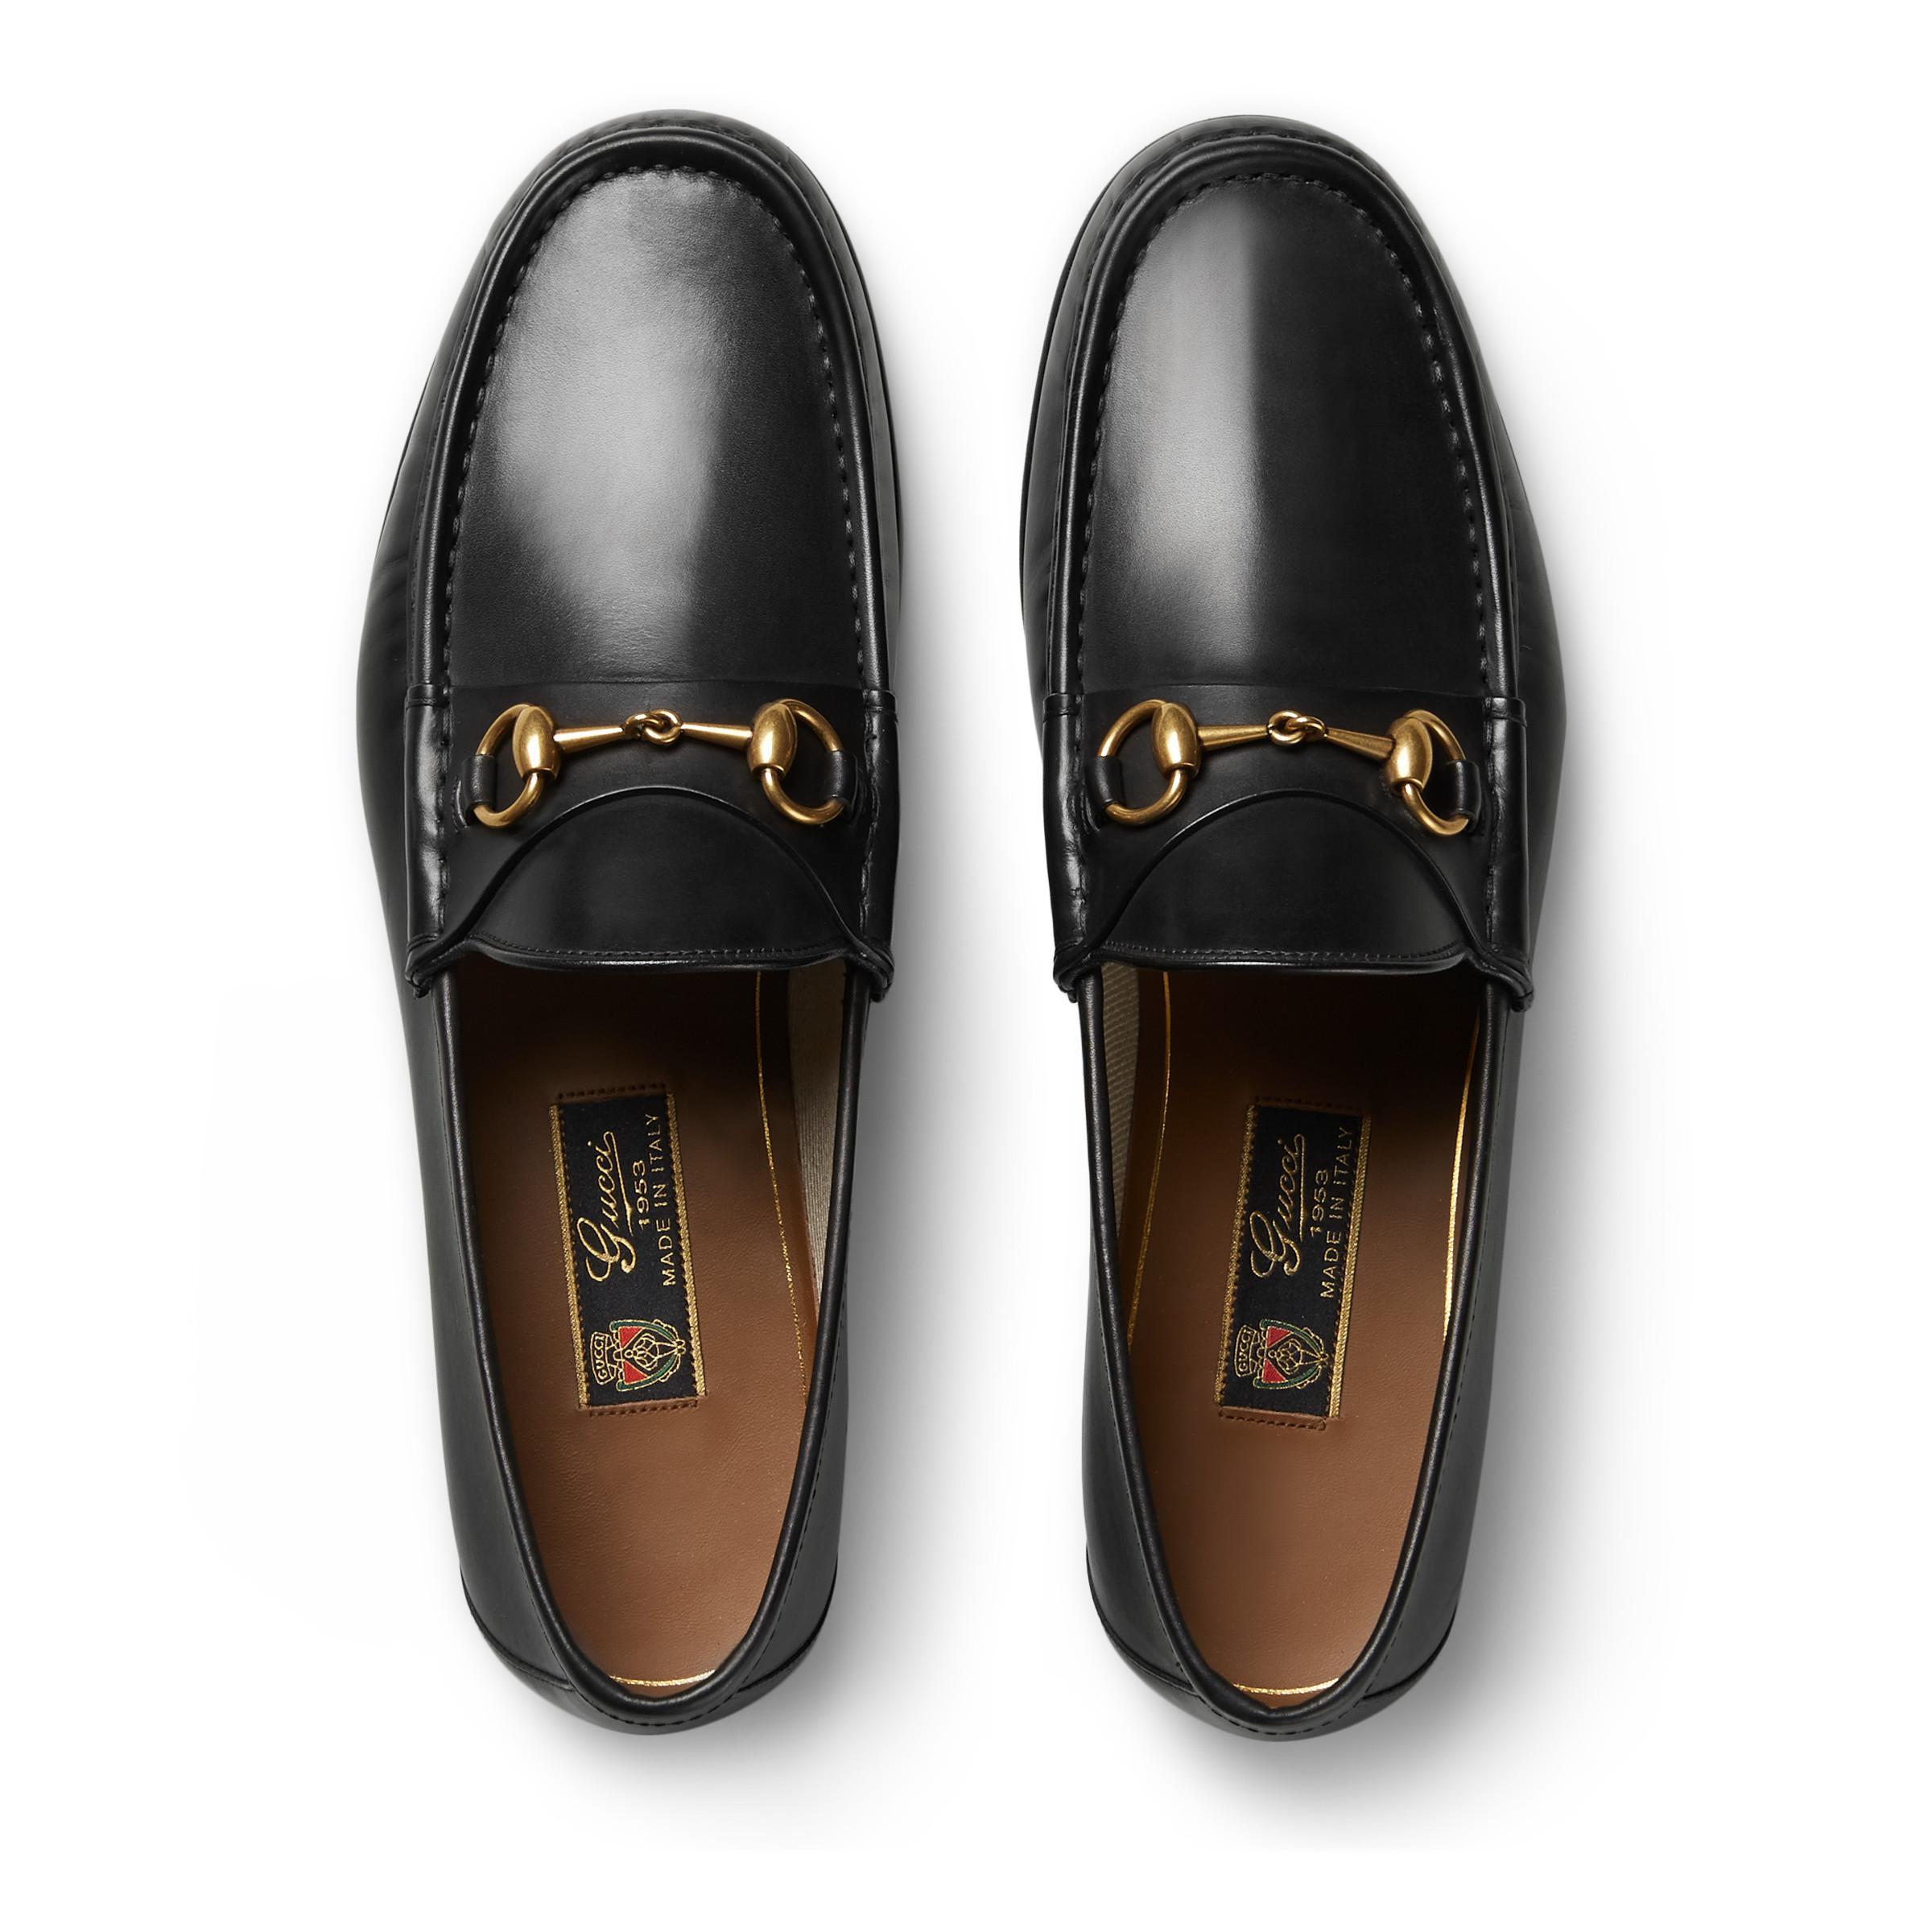 26caa2233aa Gucci - Black 1953 Horsebit Leather Loafers for Men - Lyst. View fullscreen